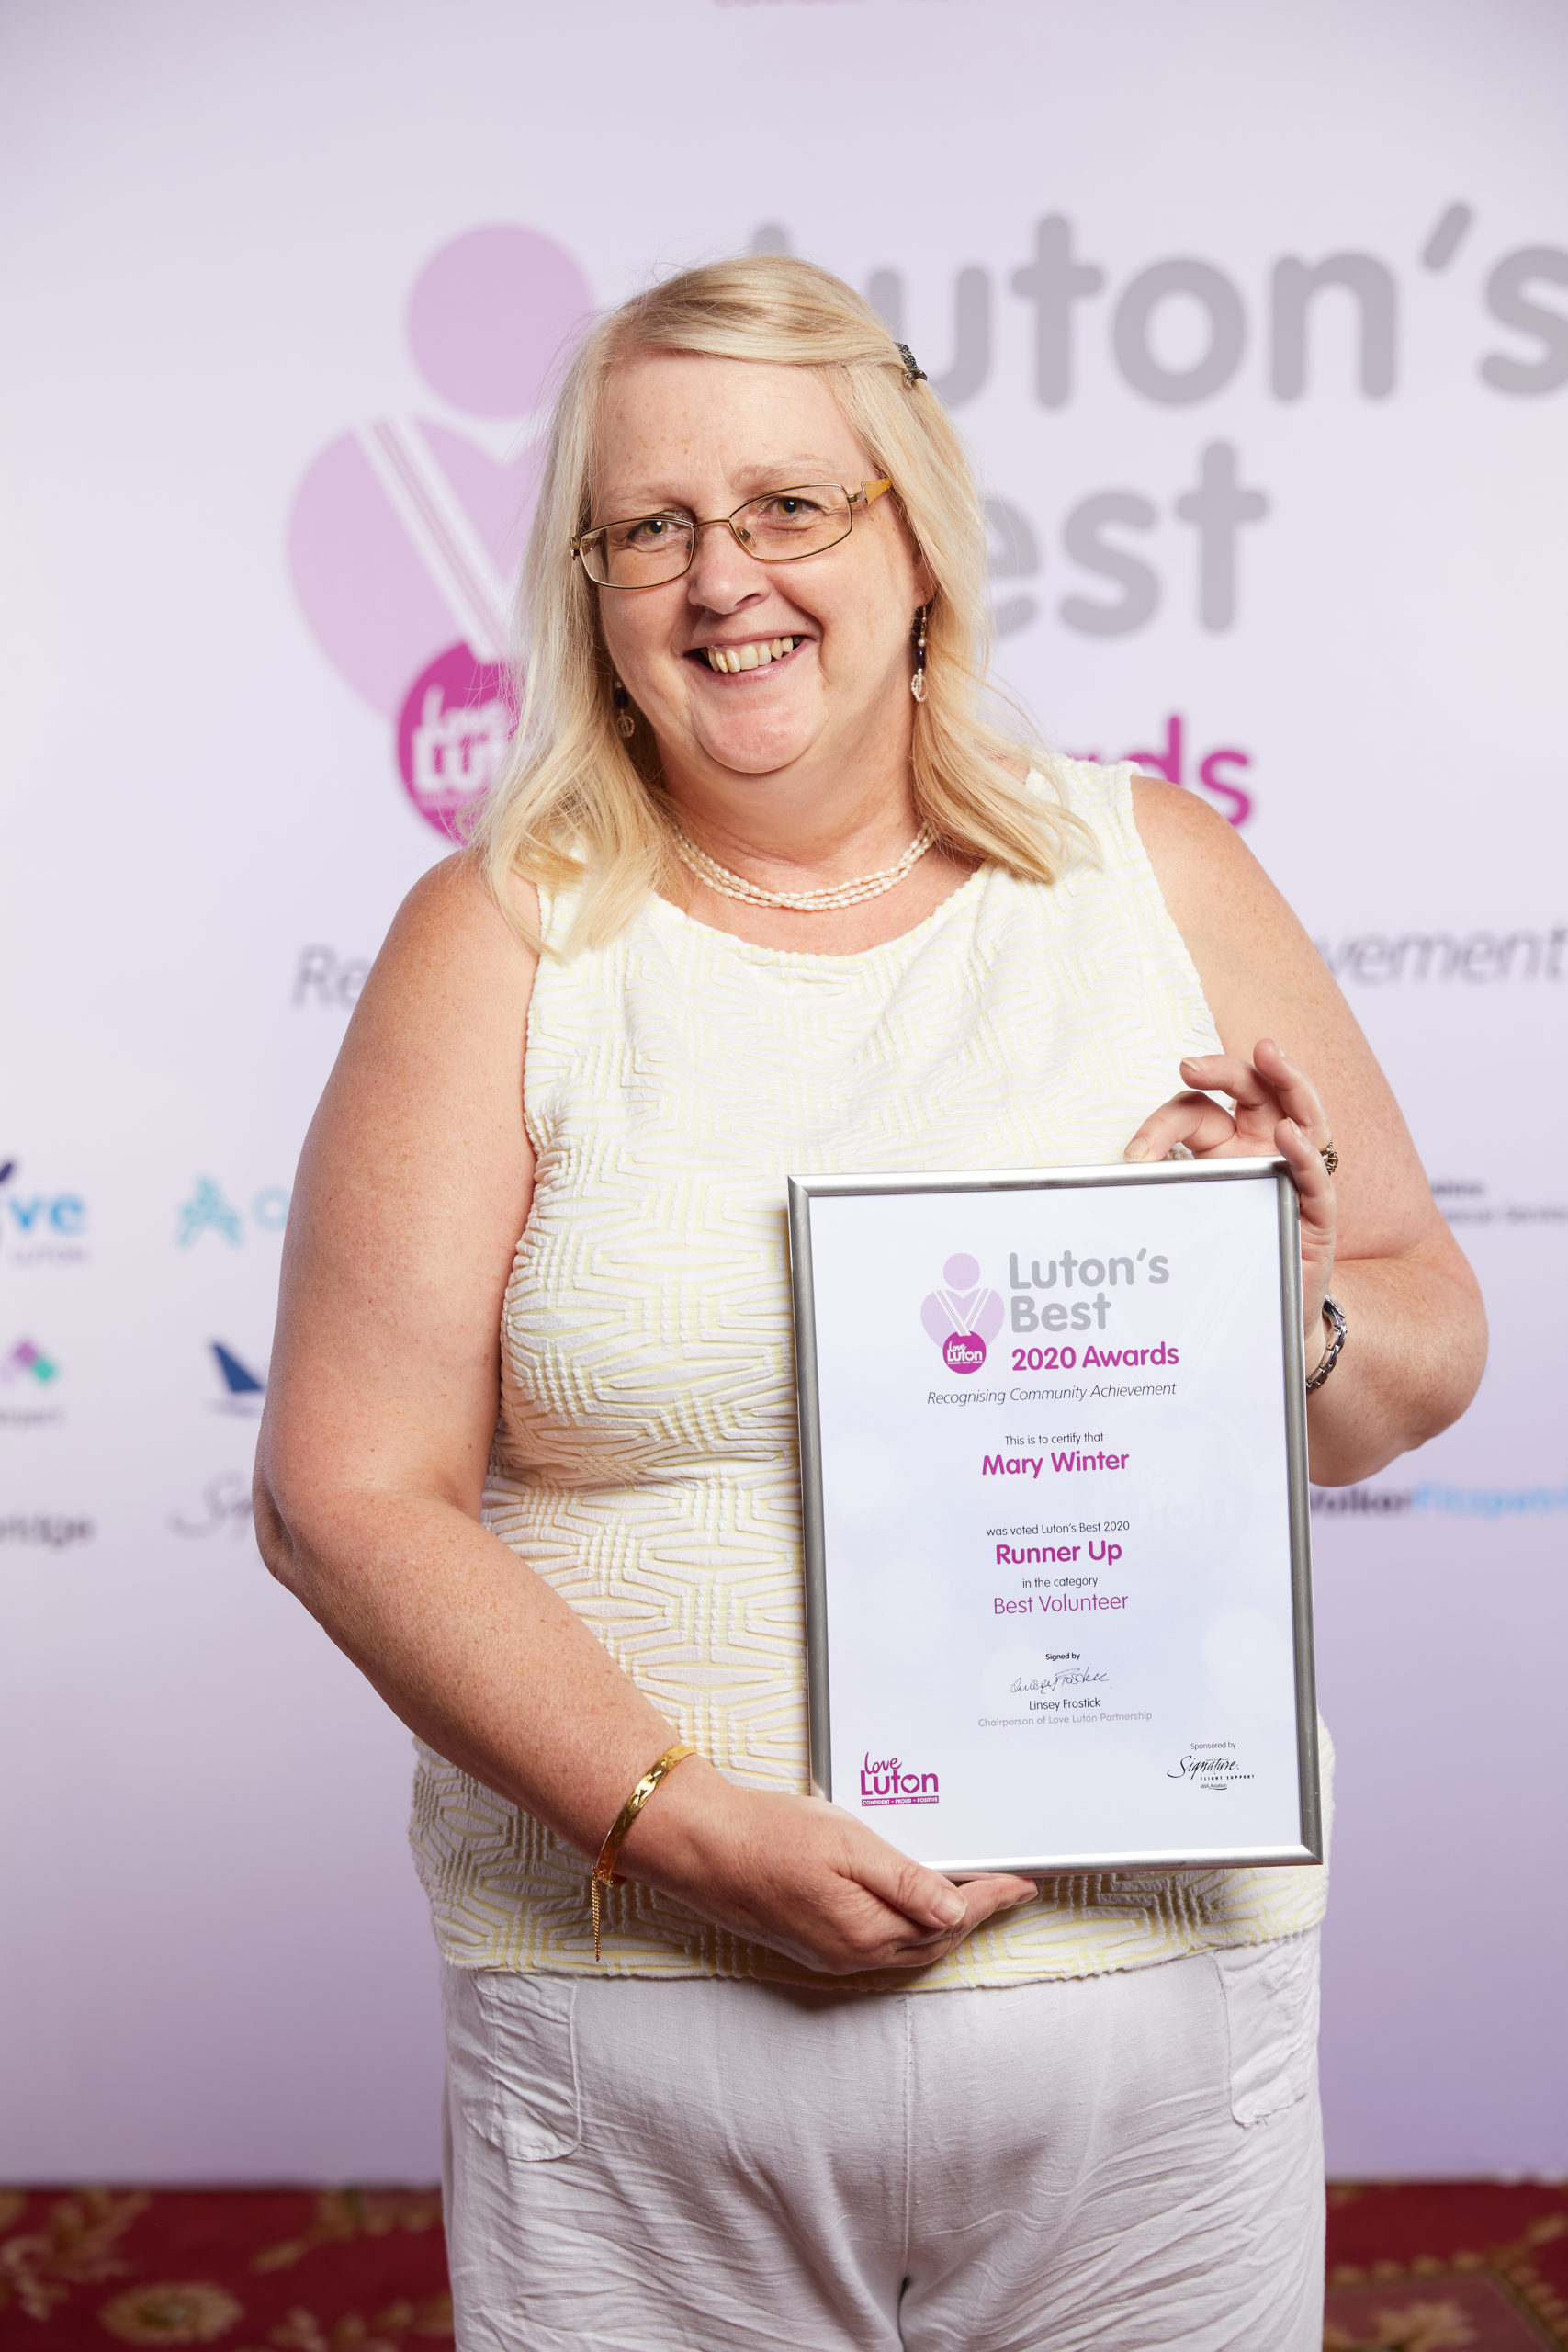 Best Volunteer Mary Winner Runner up